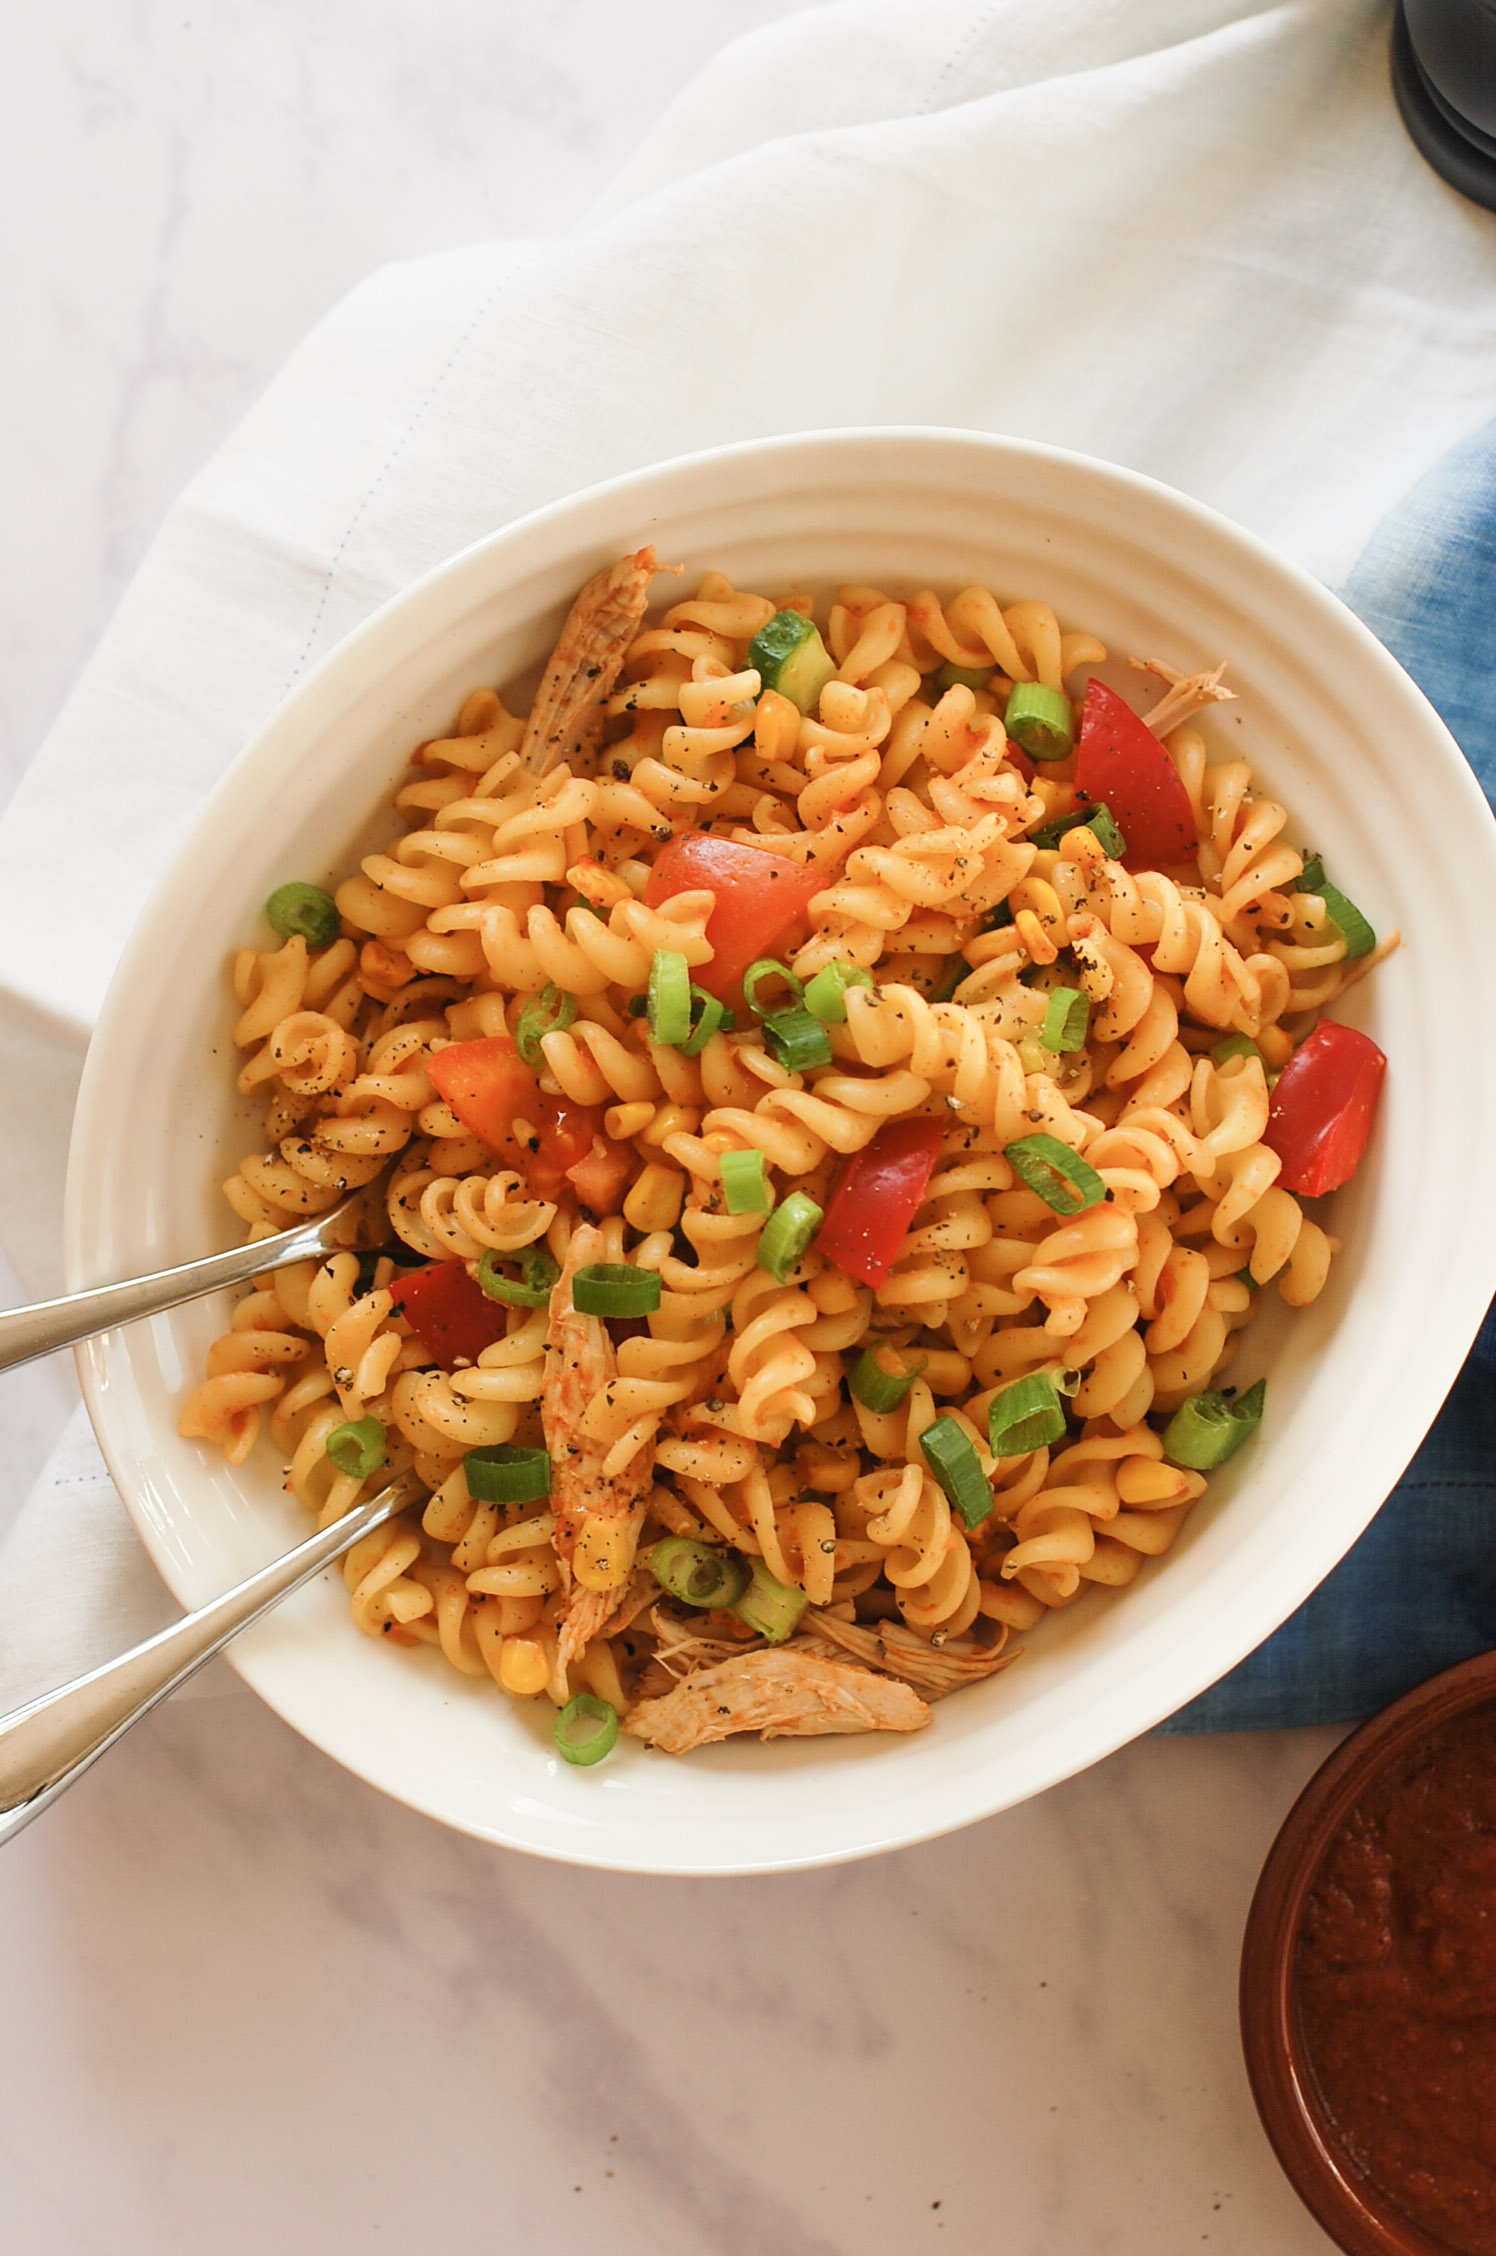 BBQ chicken pasta salad in a bowl